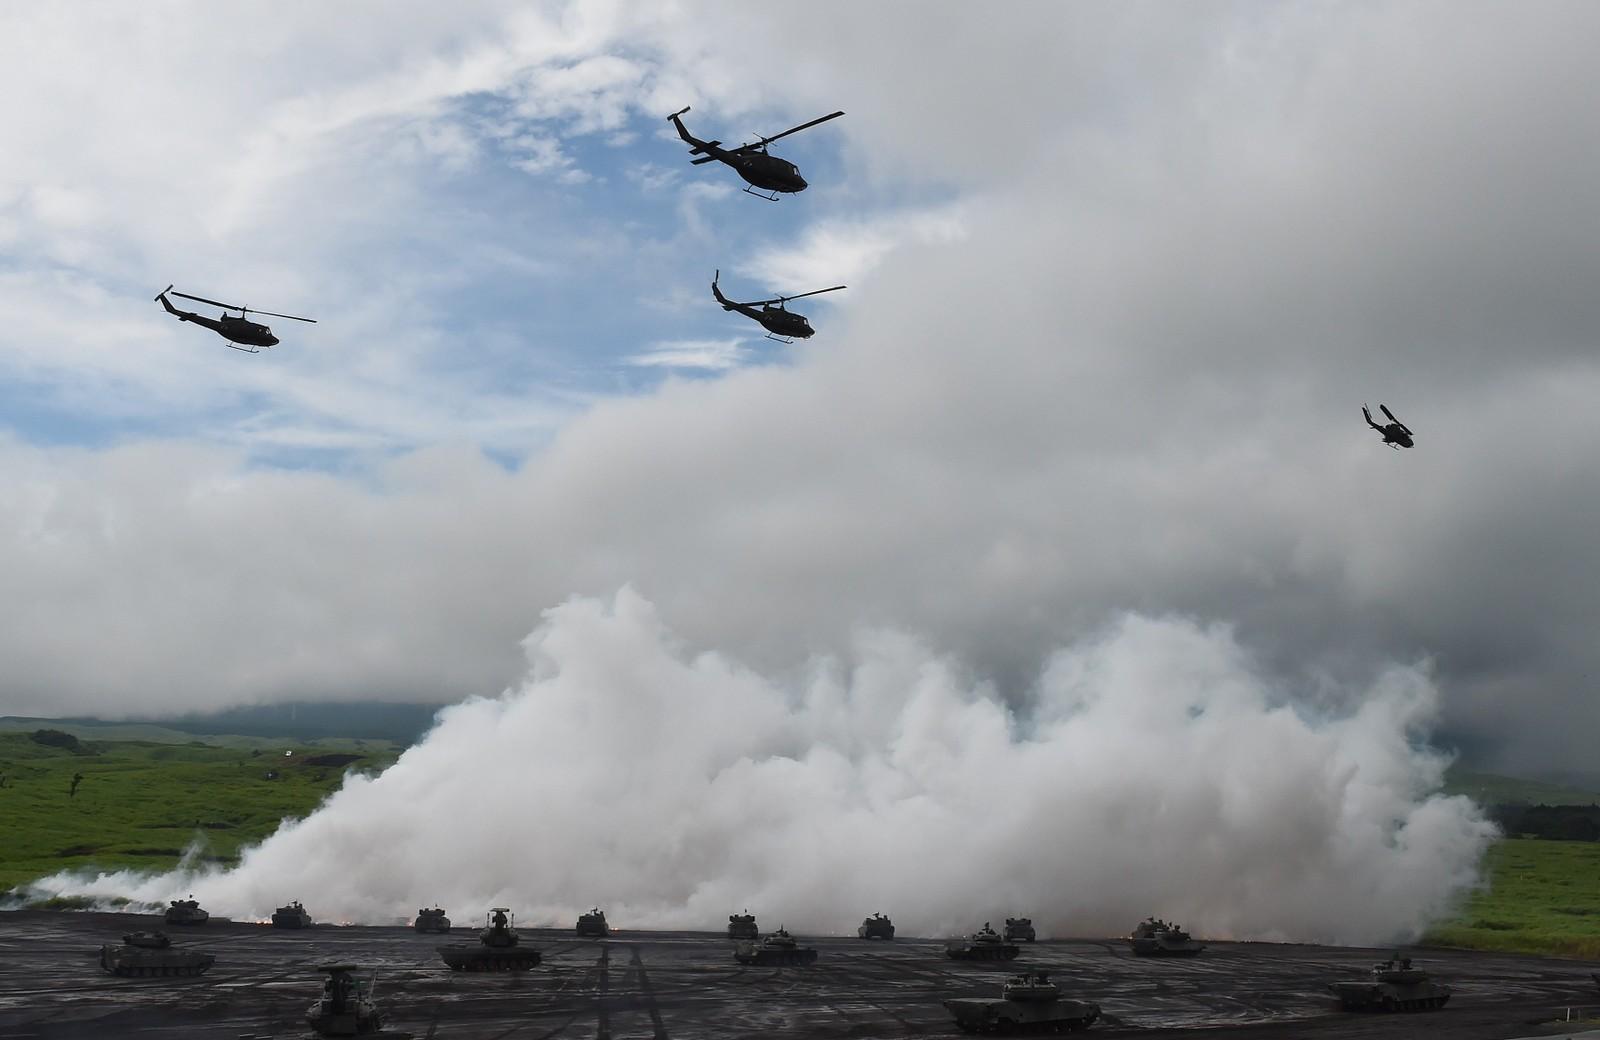 Japanske tanks og helikoptre deltar i en årlig militærøvelse ved foten av fjellet Fuji.